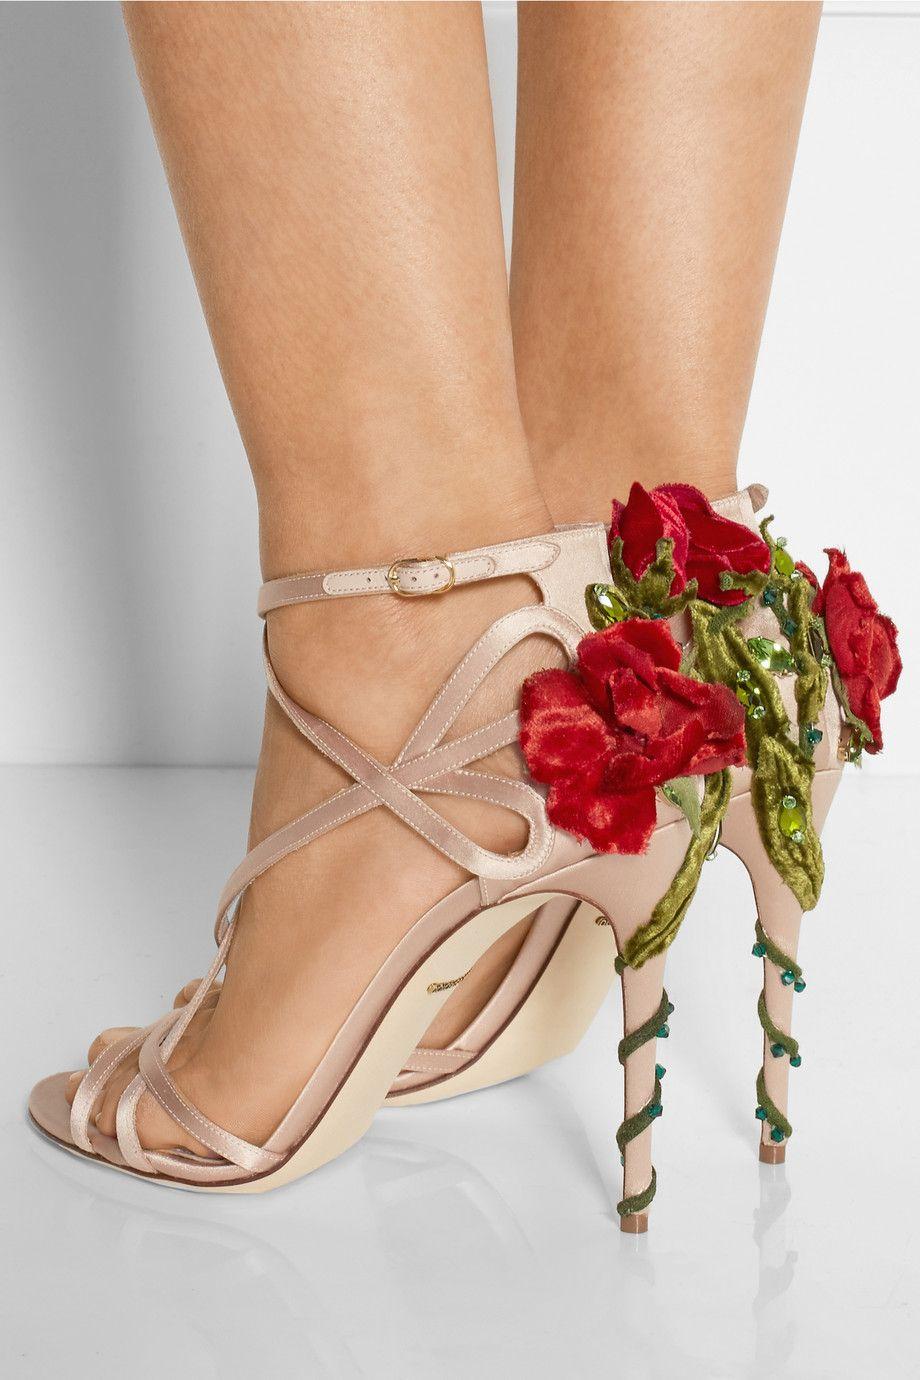 Dolce & Gabbana Embellished strappy sandals tMi835Sa1L